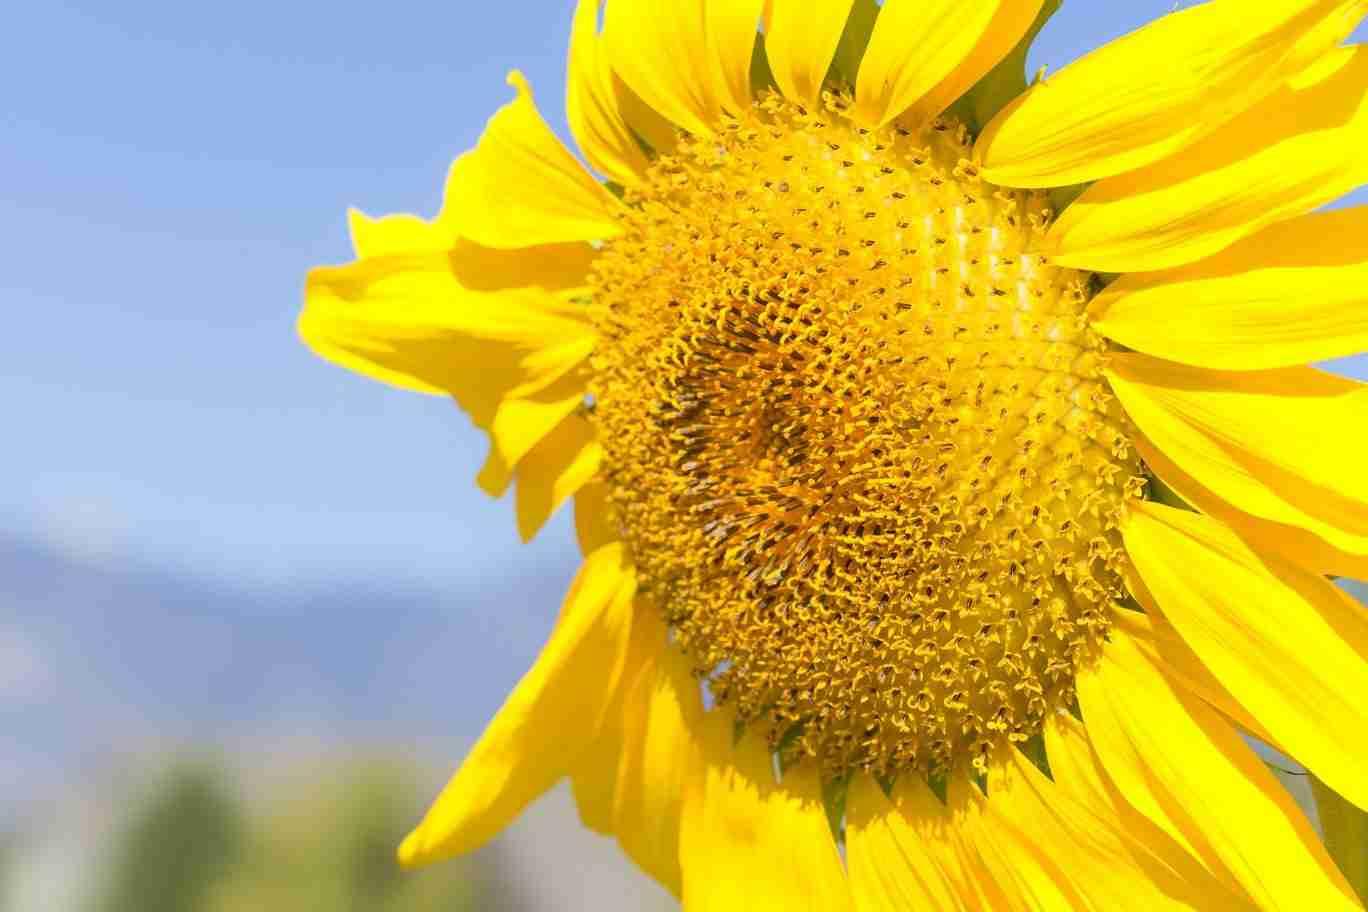 Print of a Wind Blown Yellow Sunflower